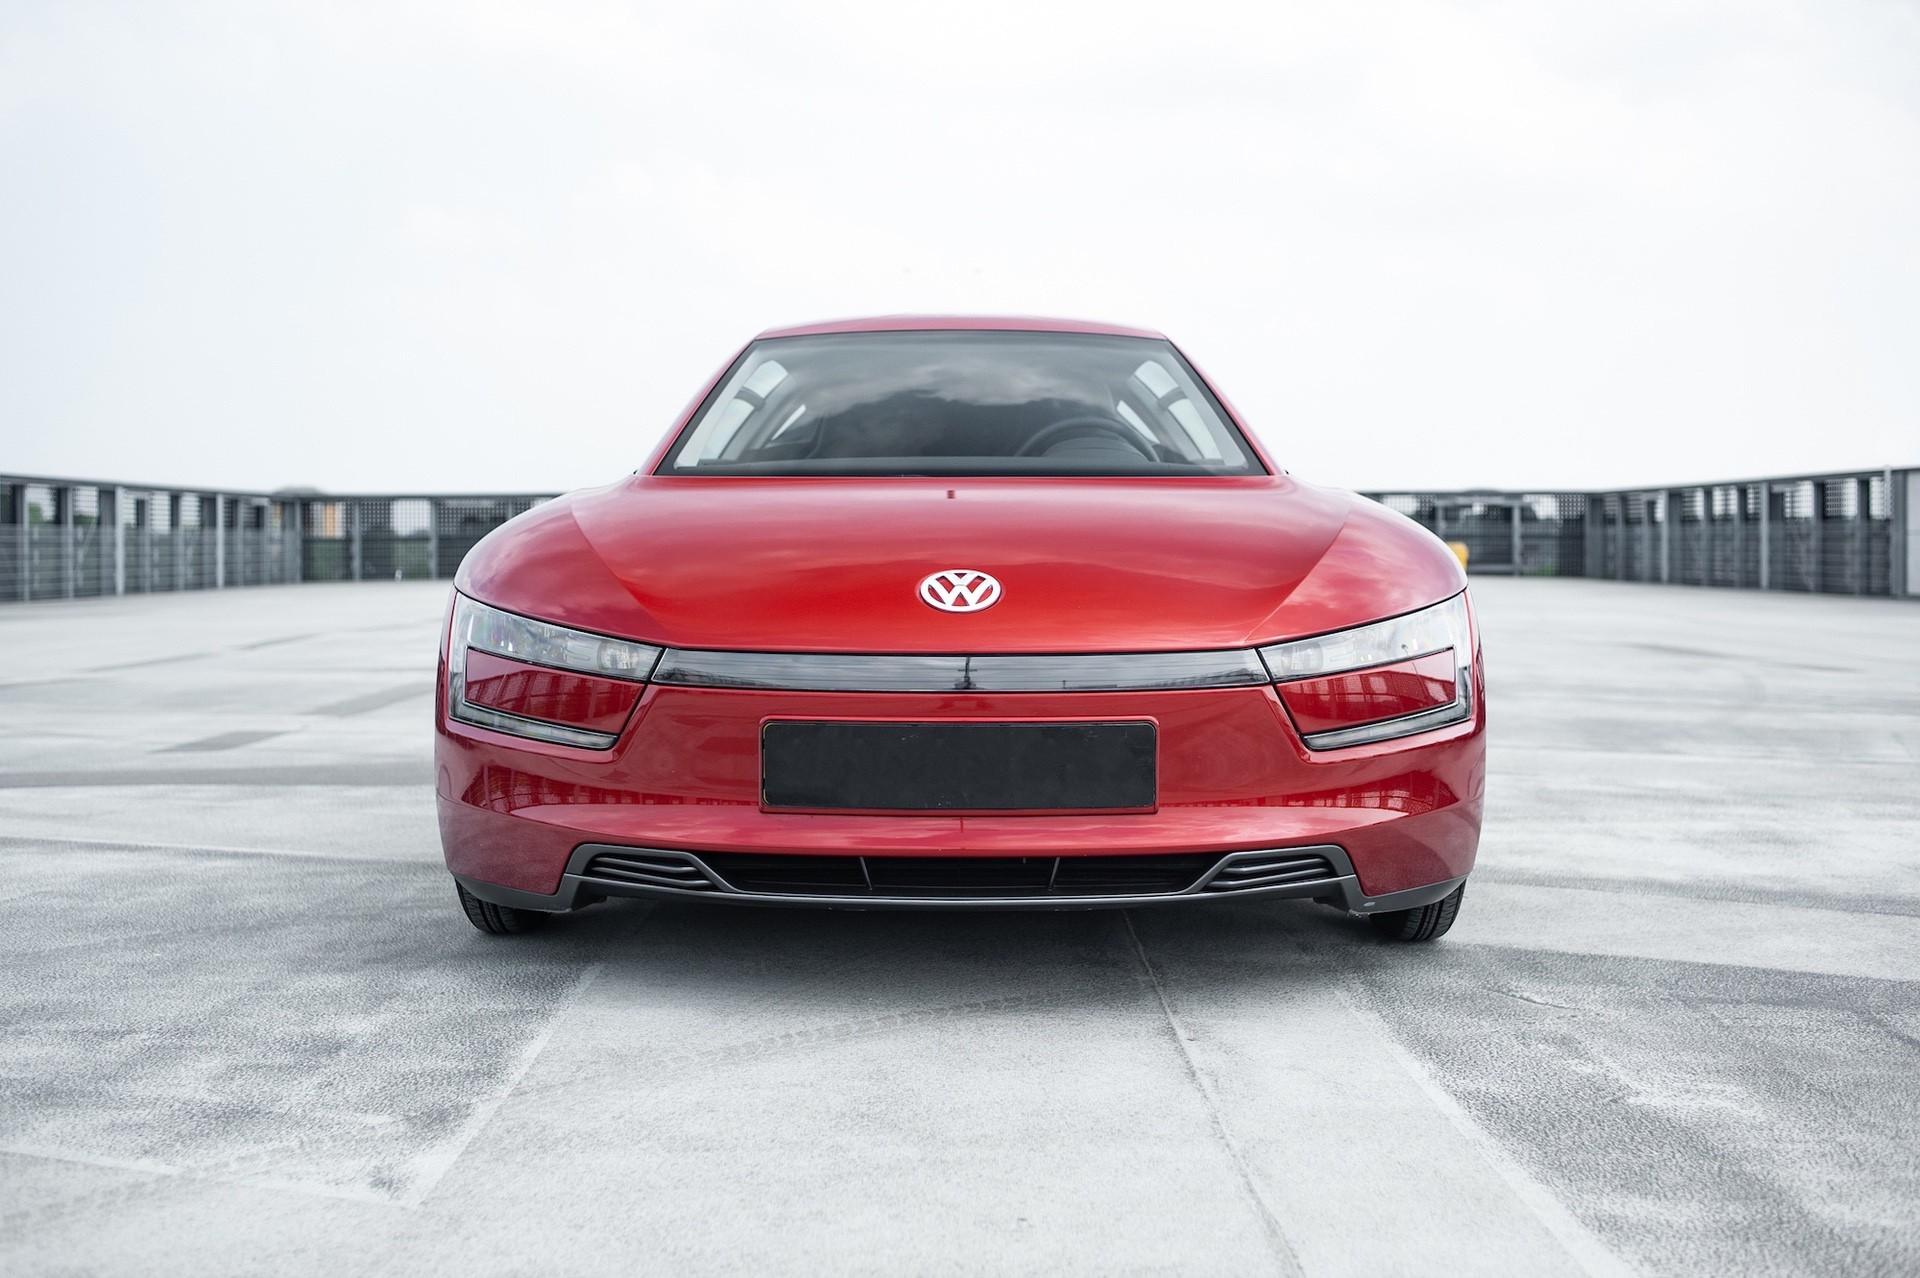 Volkswagen_XL1_sale-0038